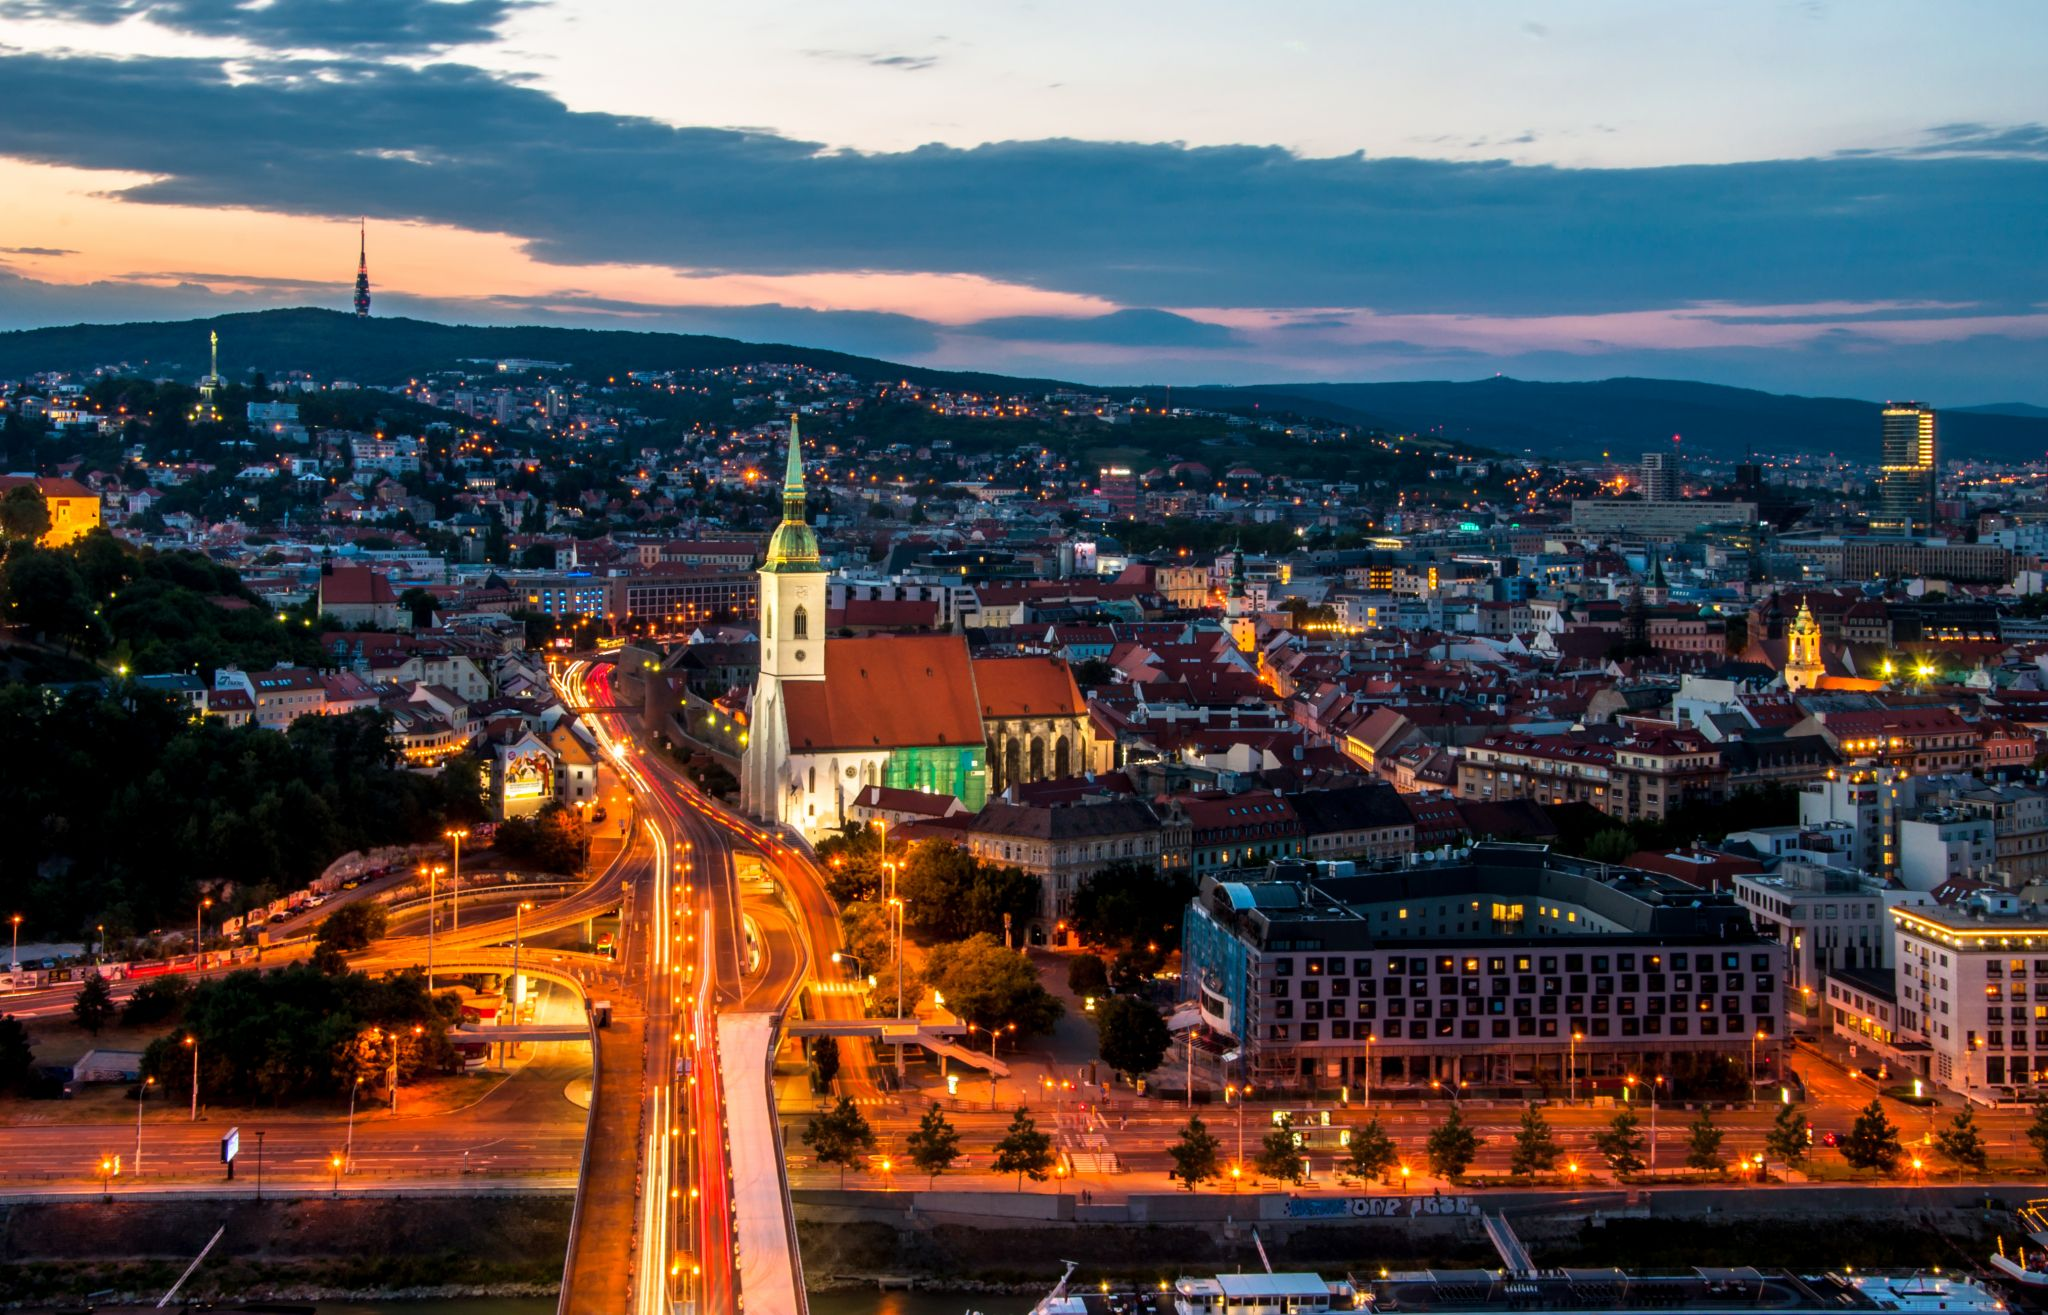 UFO Tower in Bratislava, Slovakia (Slovak Republic)